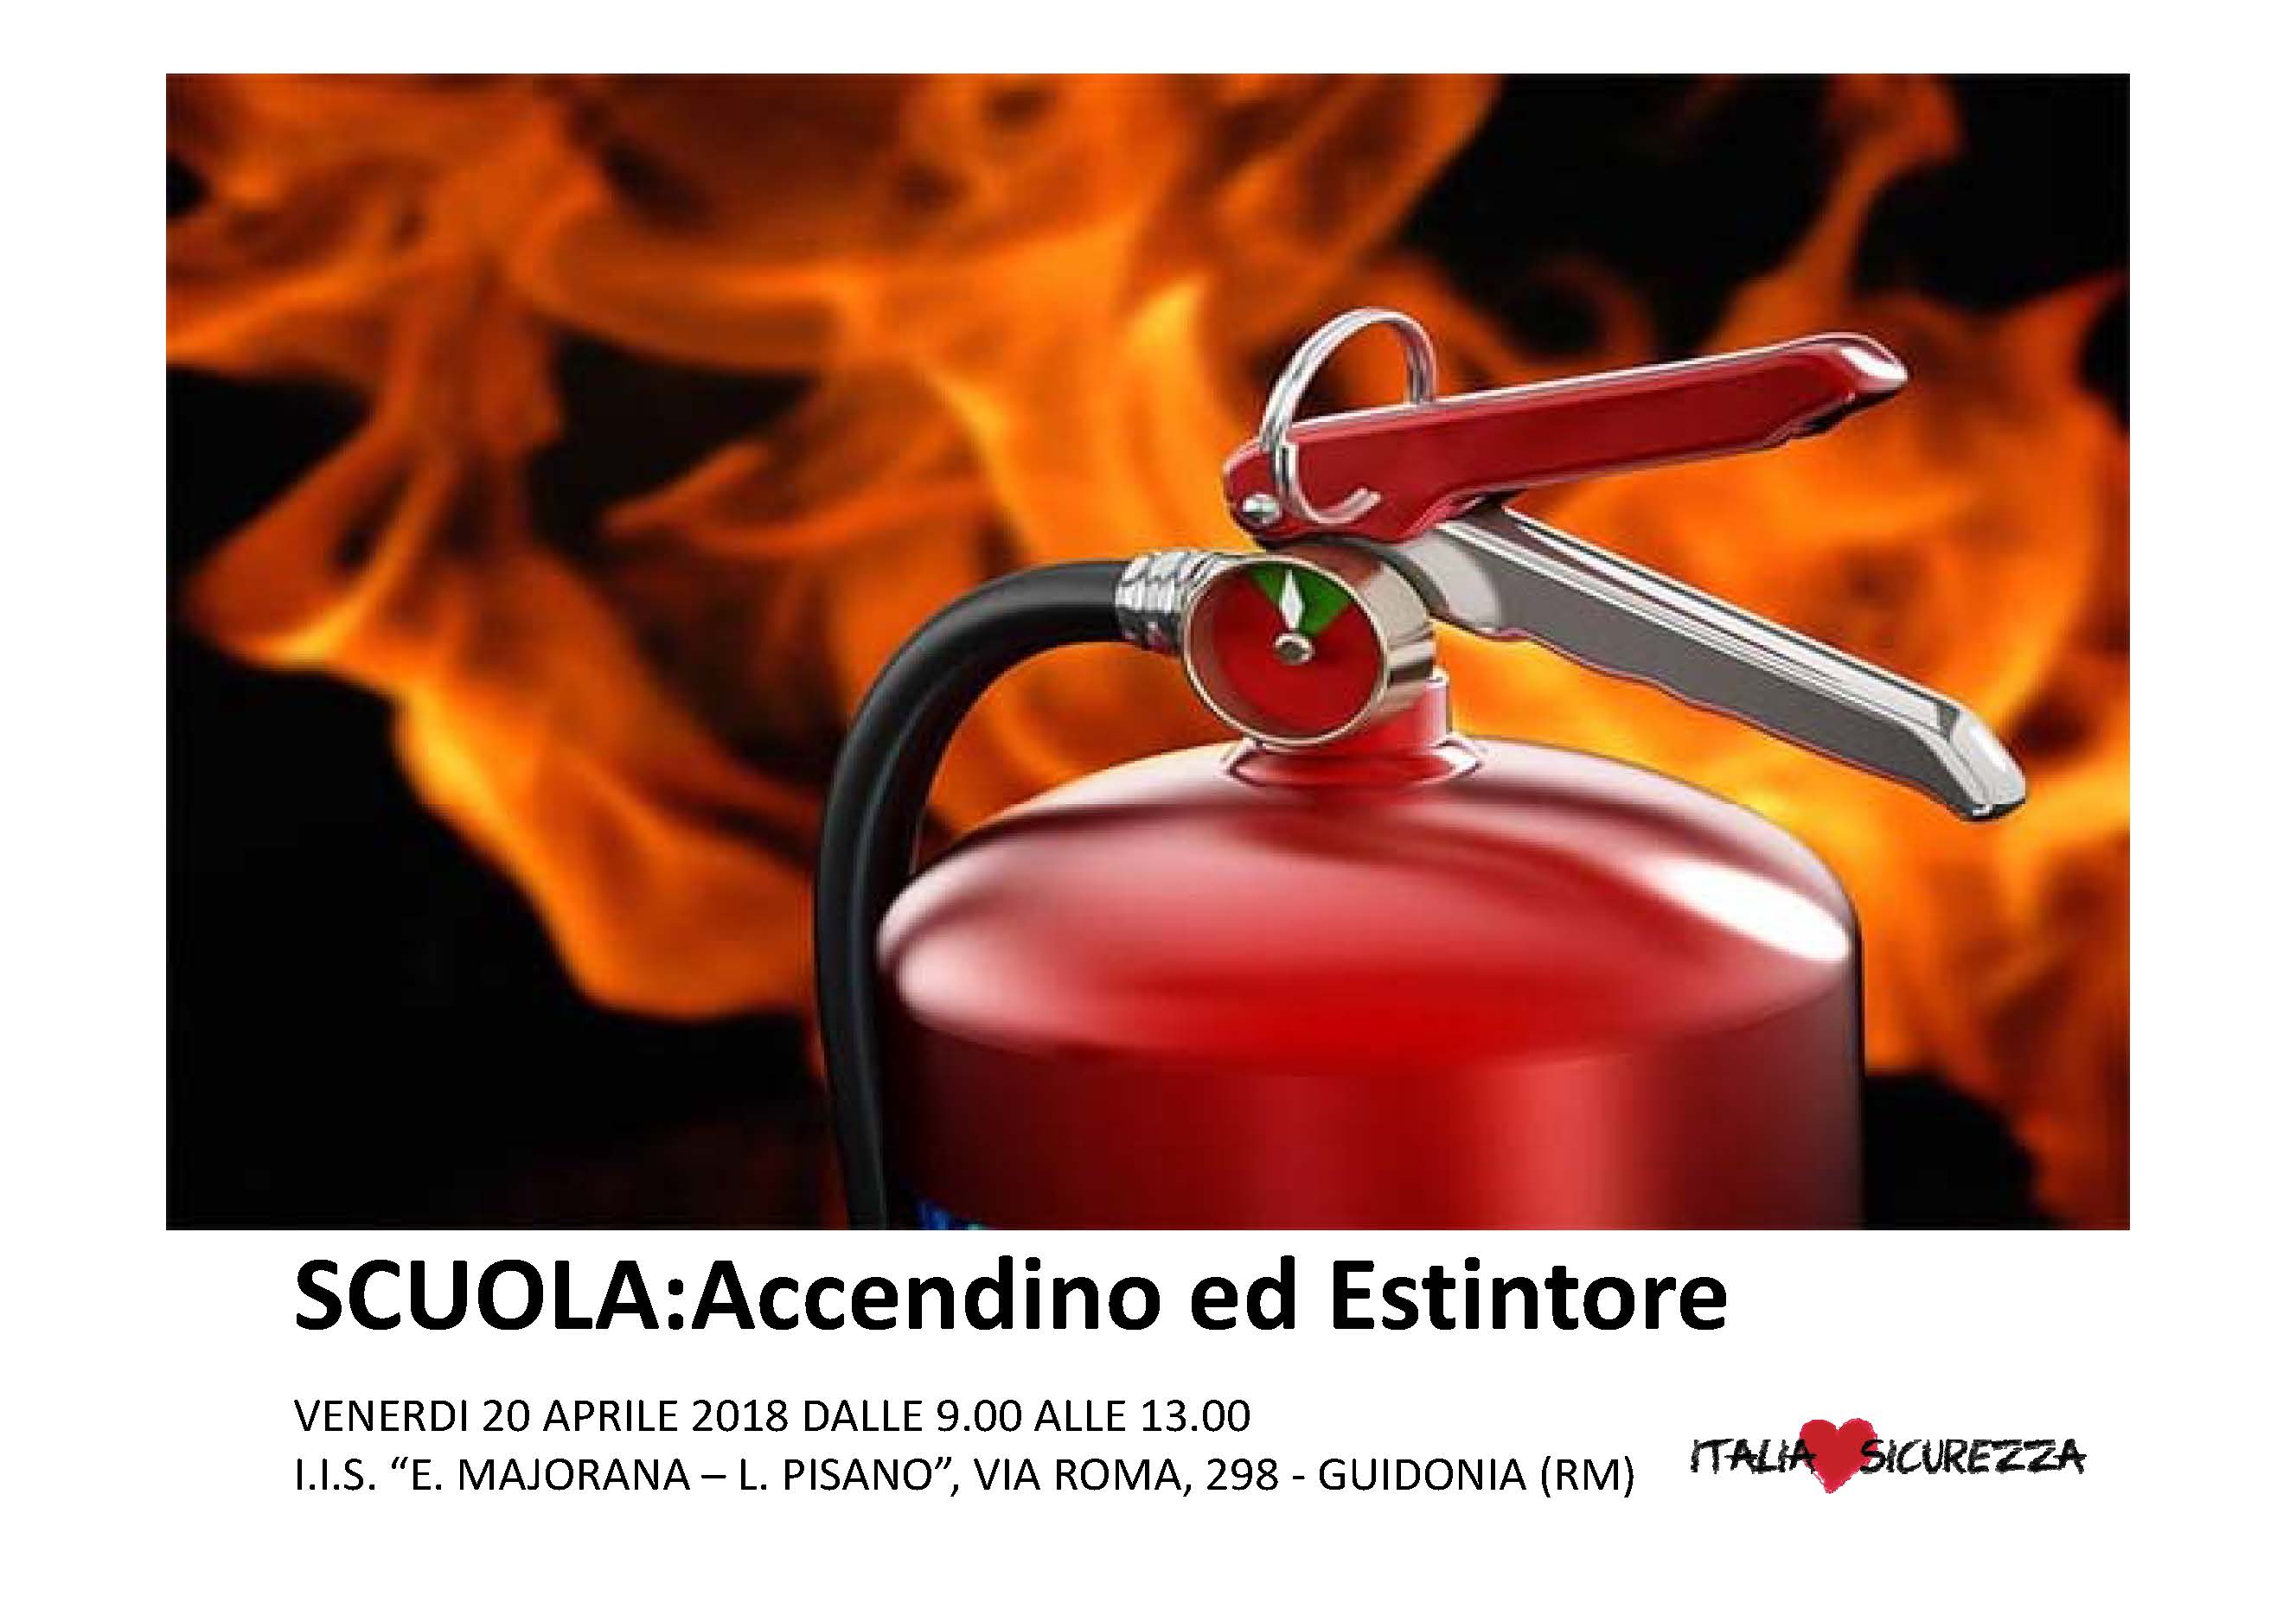 http://www.fondlhs.org/wp-content/uploads/2018/03/Locandina-Evento-20-Aprile-2018.jpg